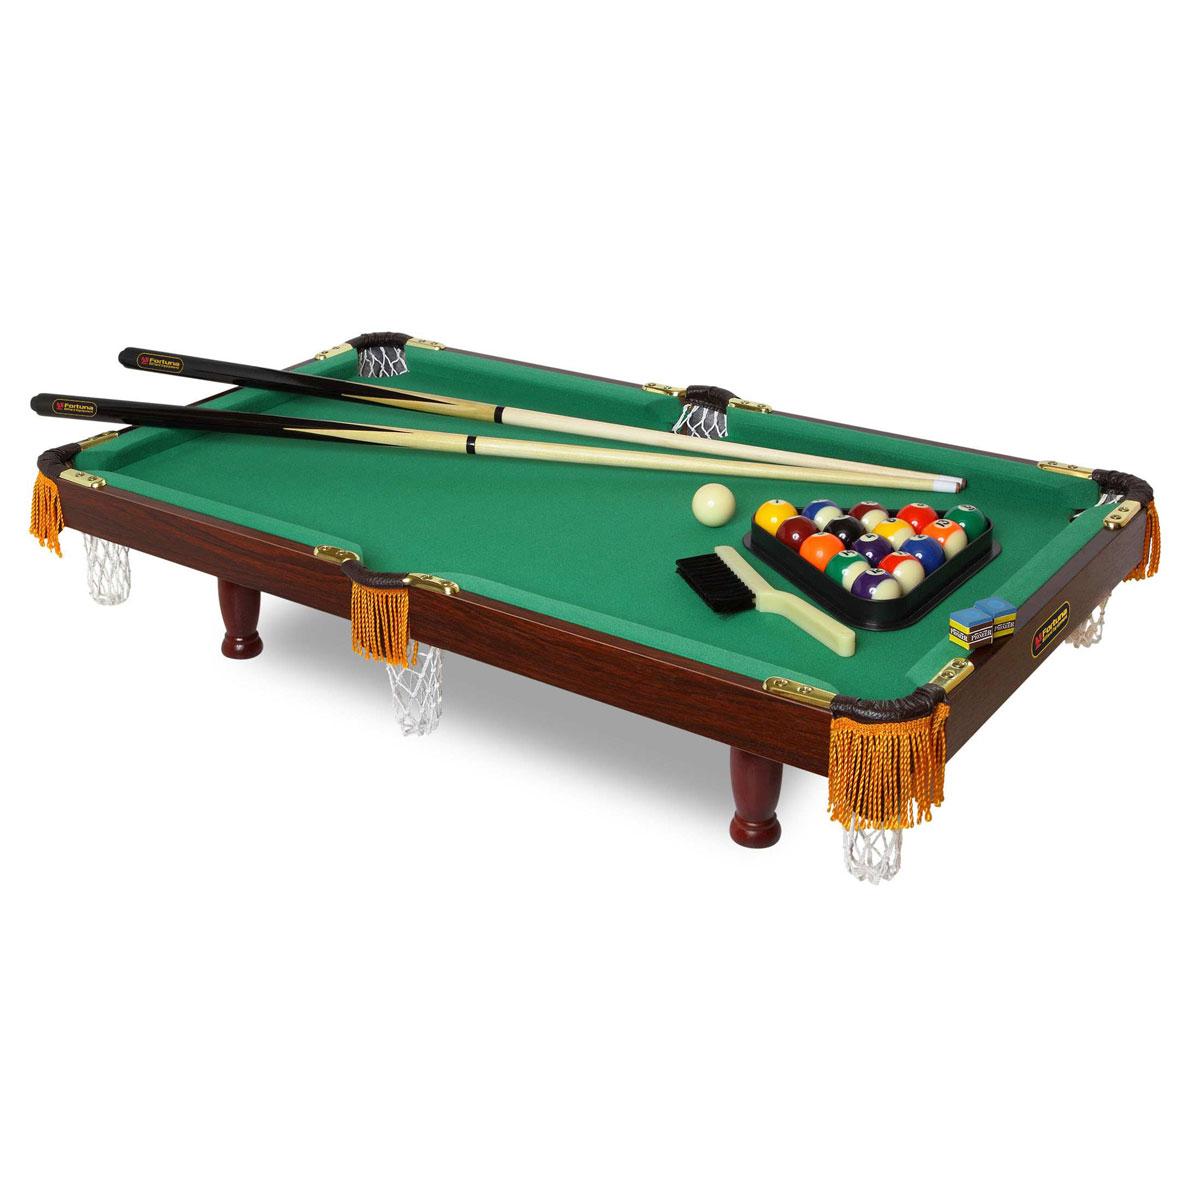 "Fortuna Billiard Стол бильярдный ""Fortuna"", для американского пула, 84 см х 42 см 04038"